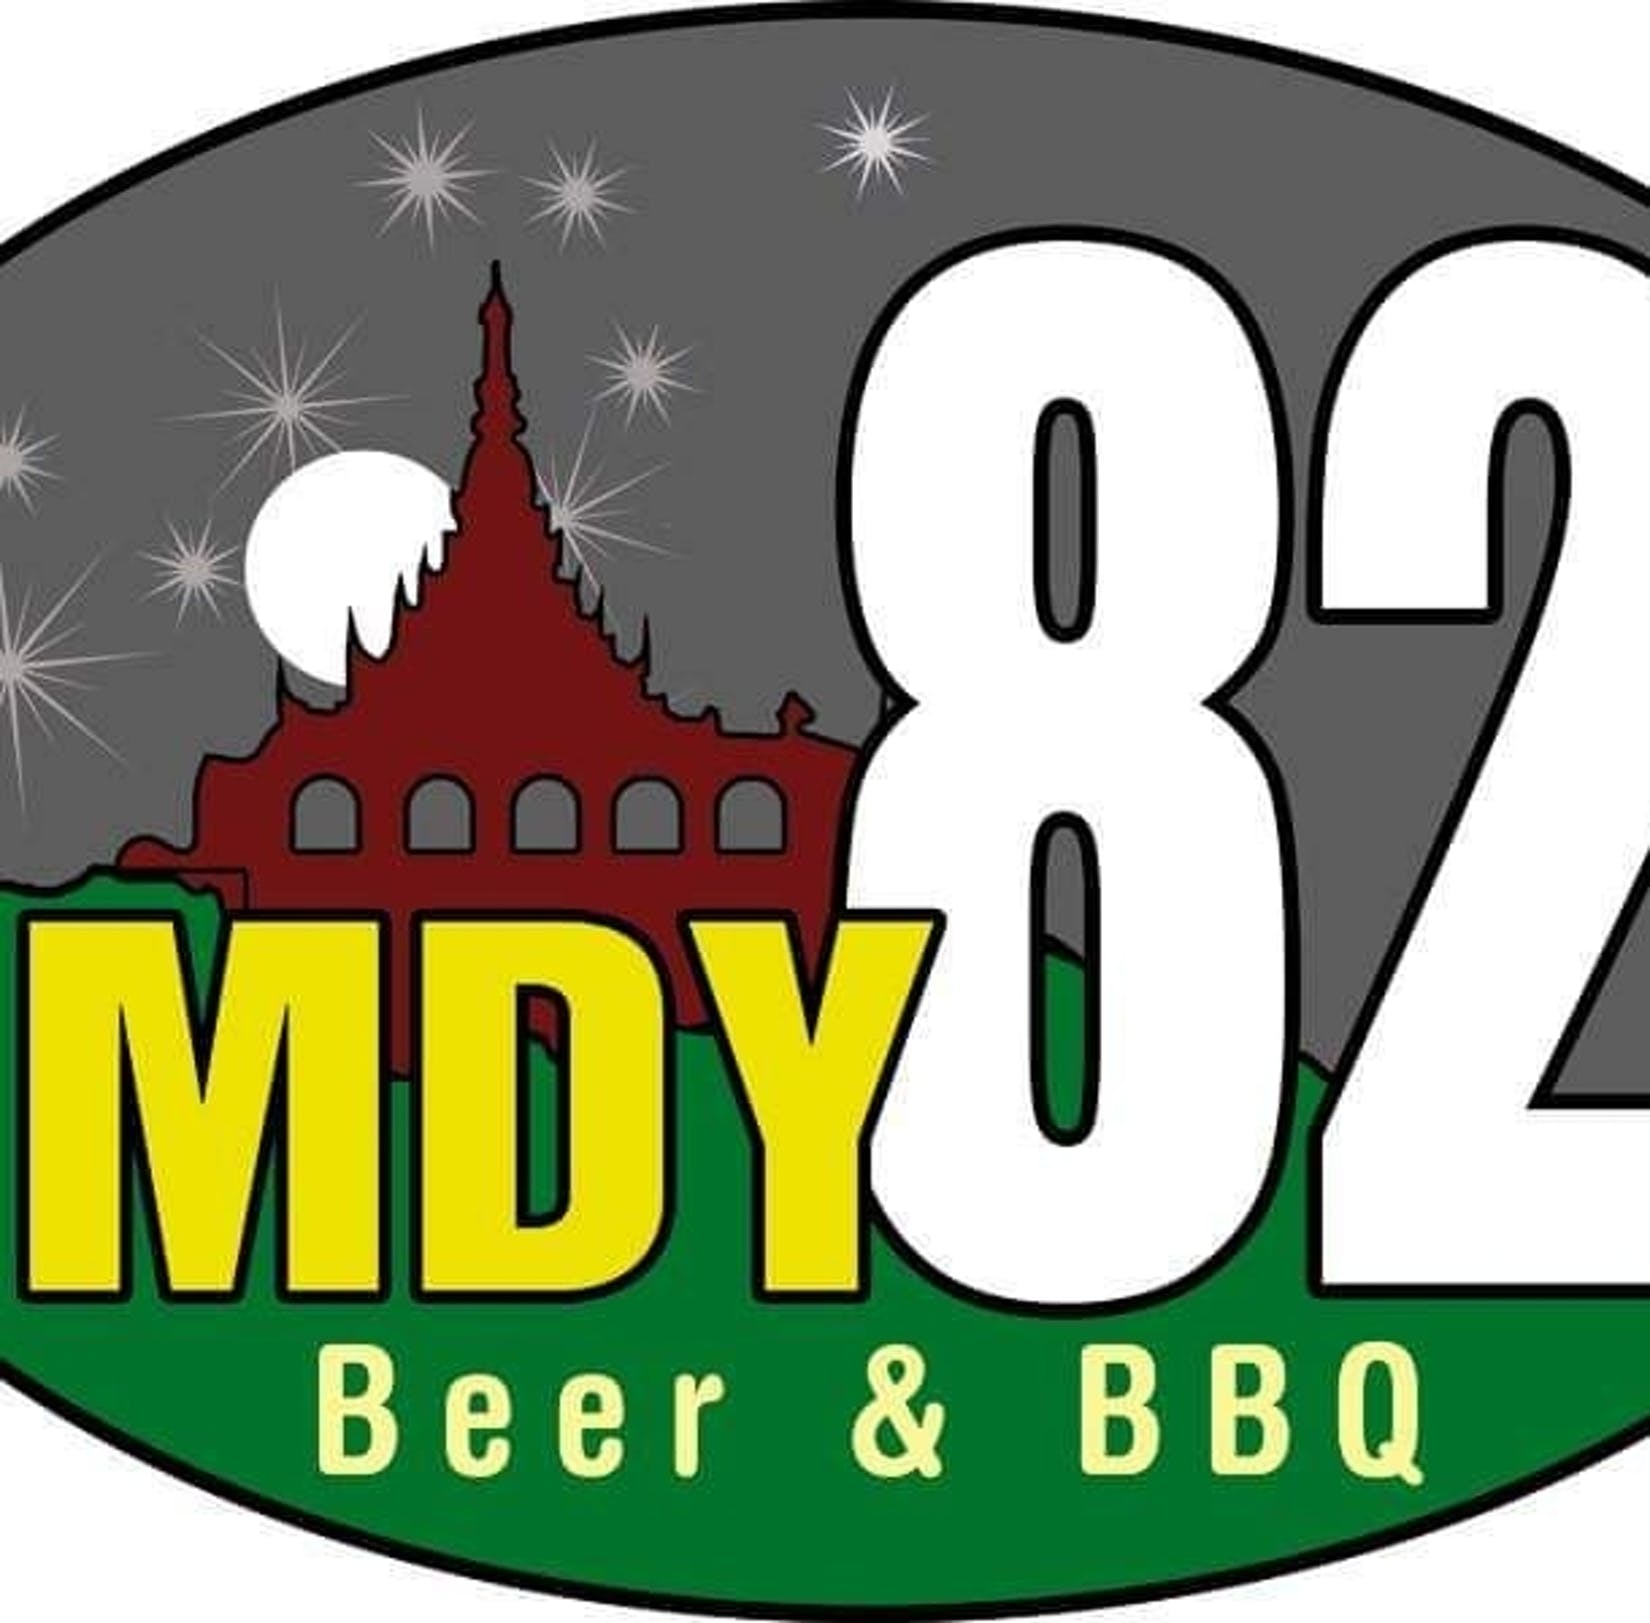 MDY82 BEER & BBQ | yathar